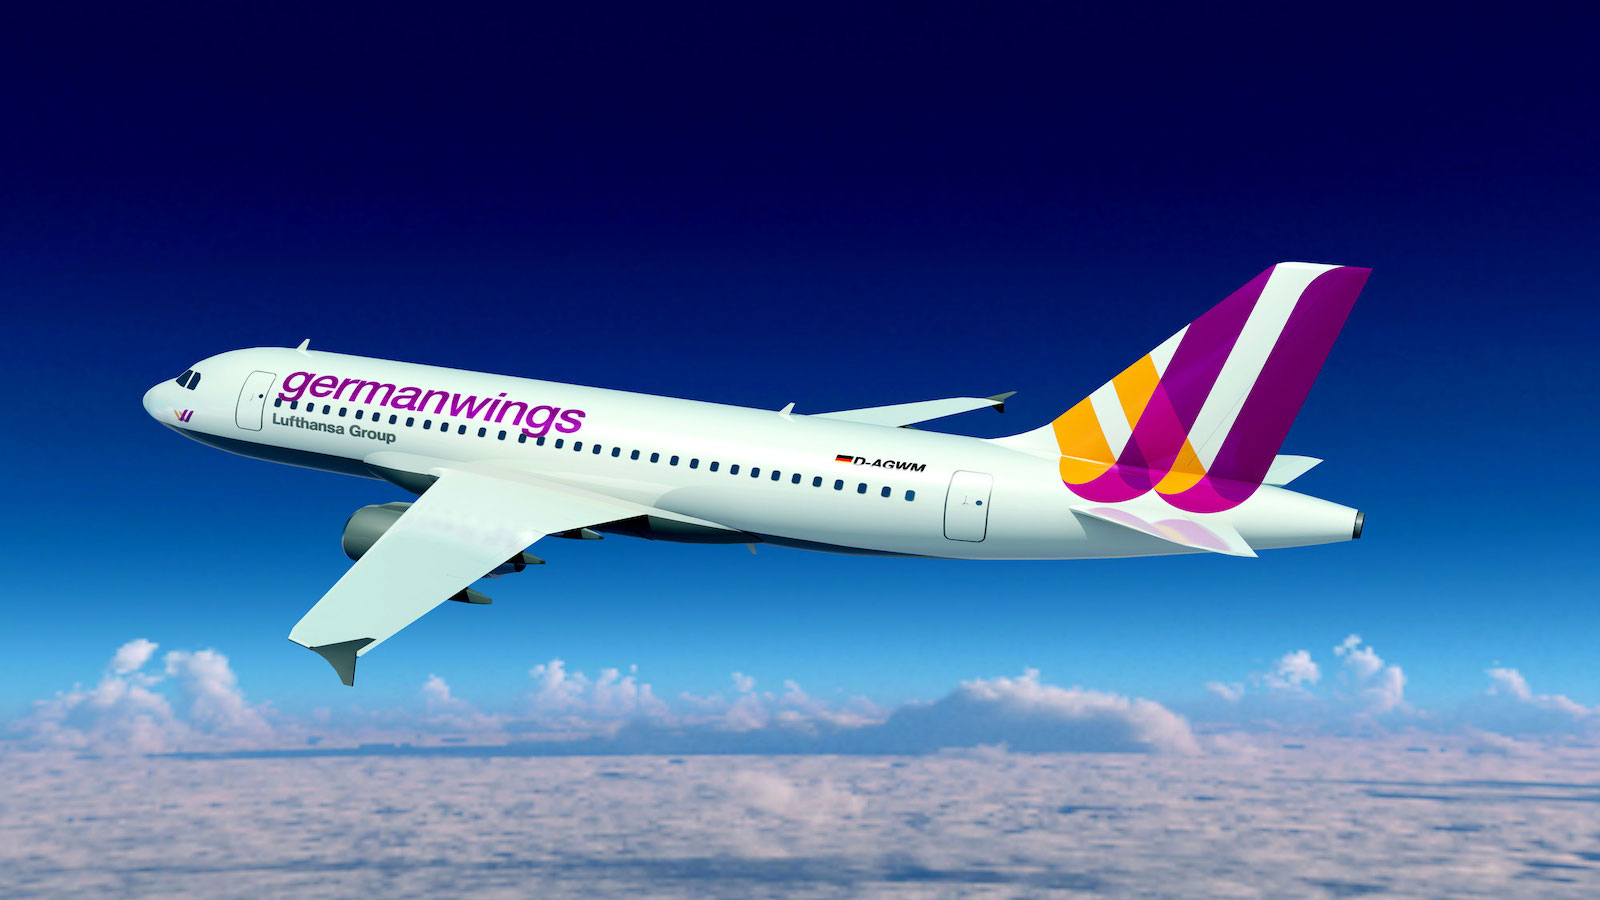 Airbus A320 de Germanwings